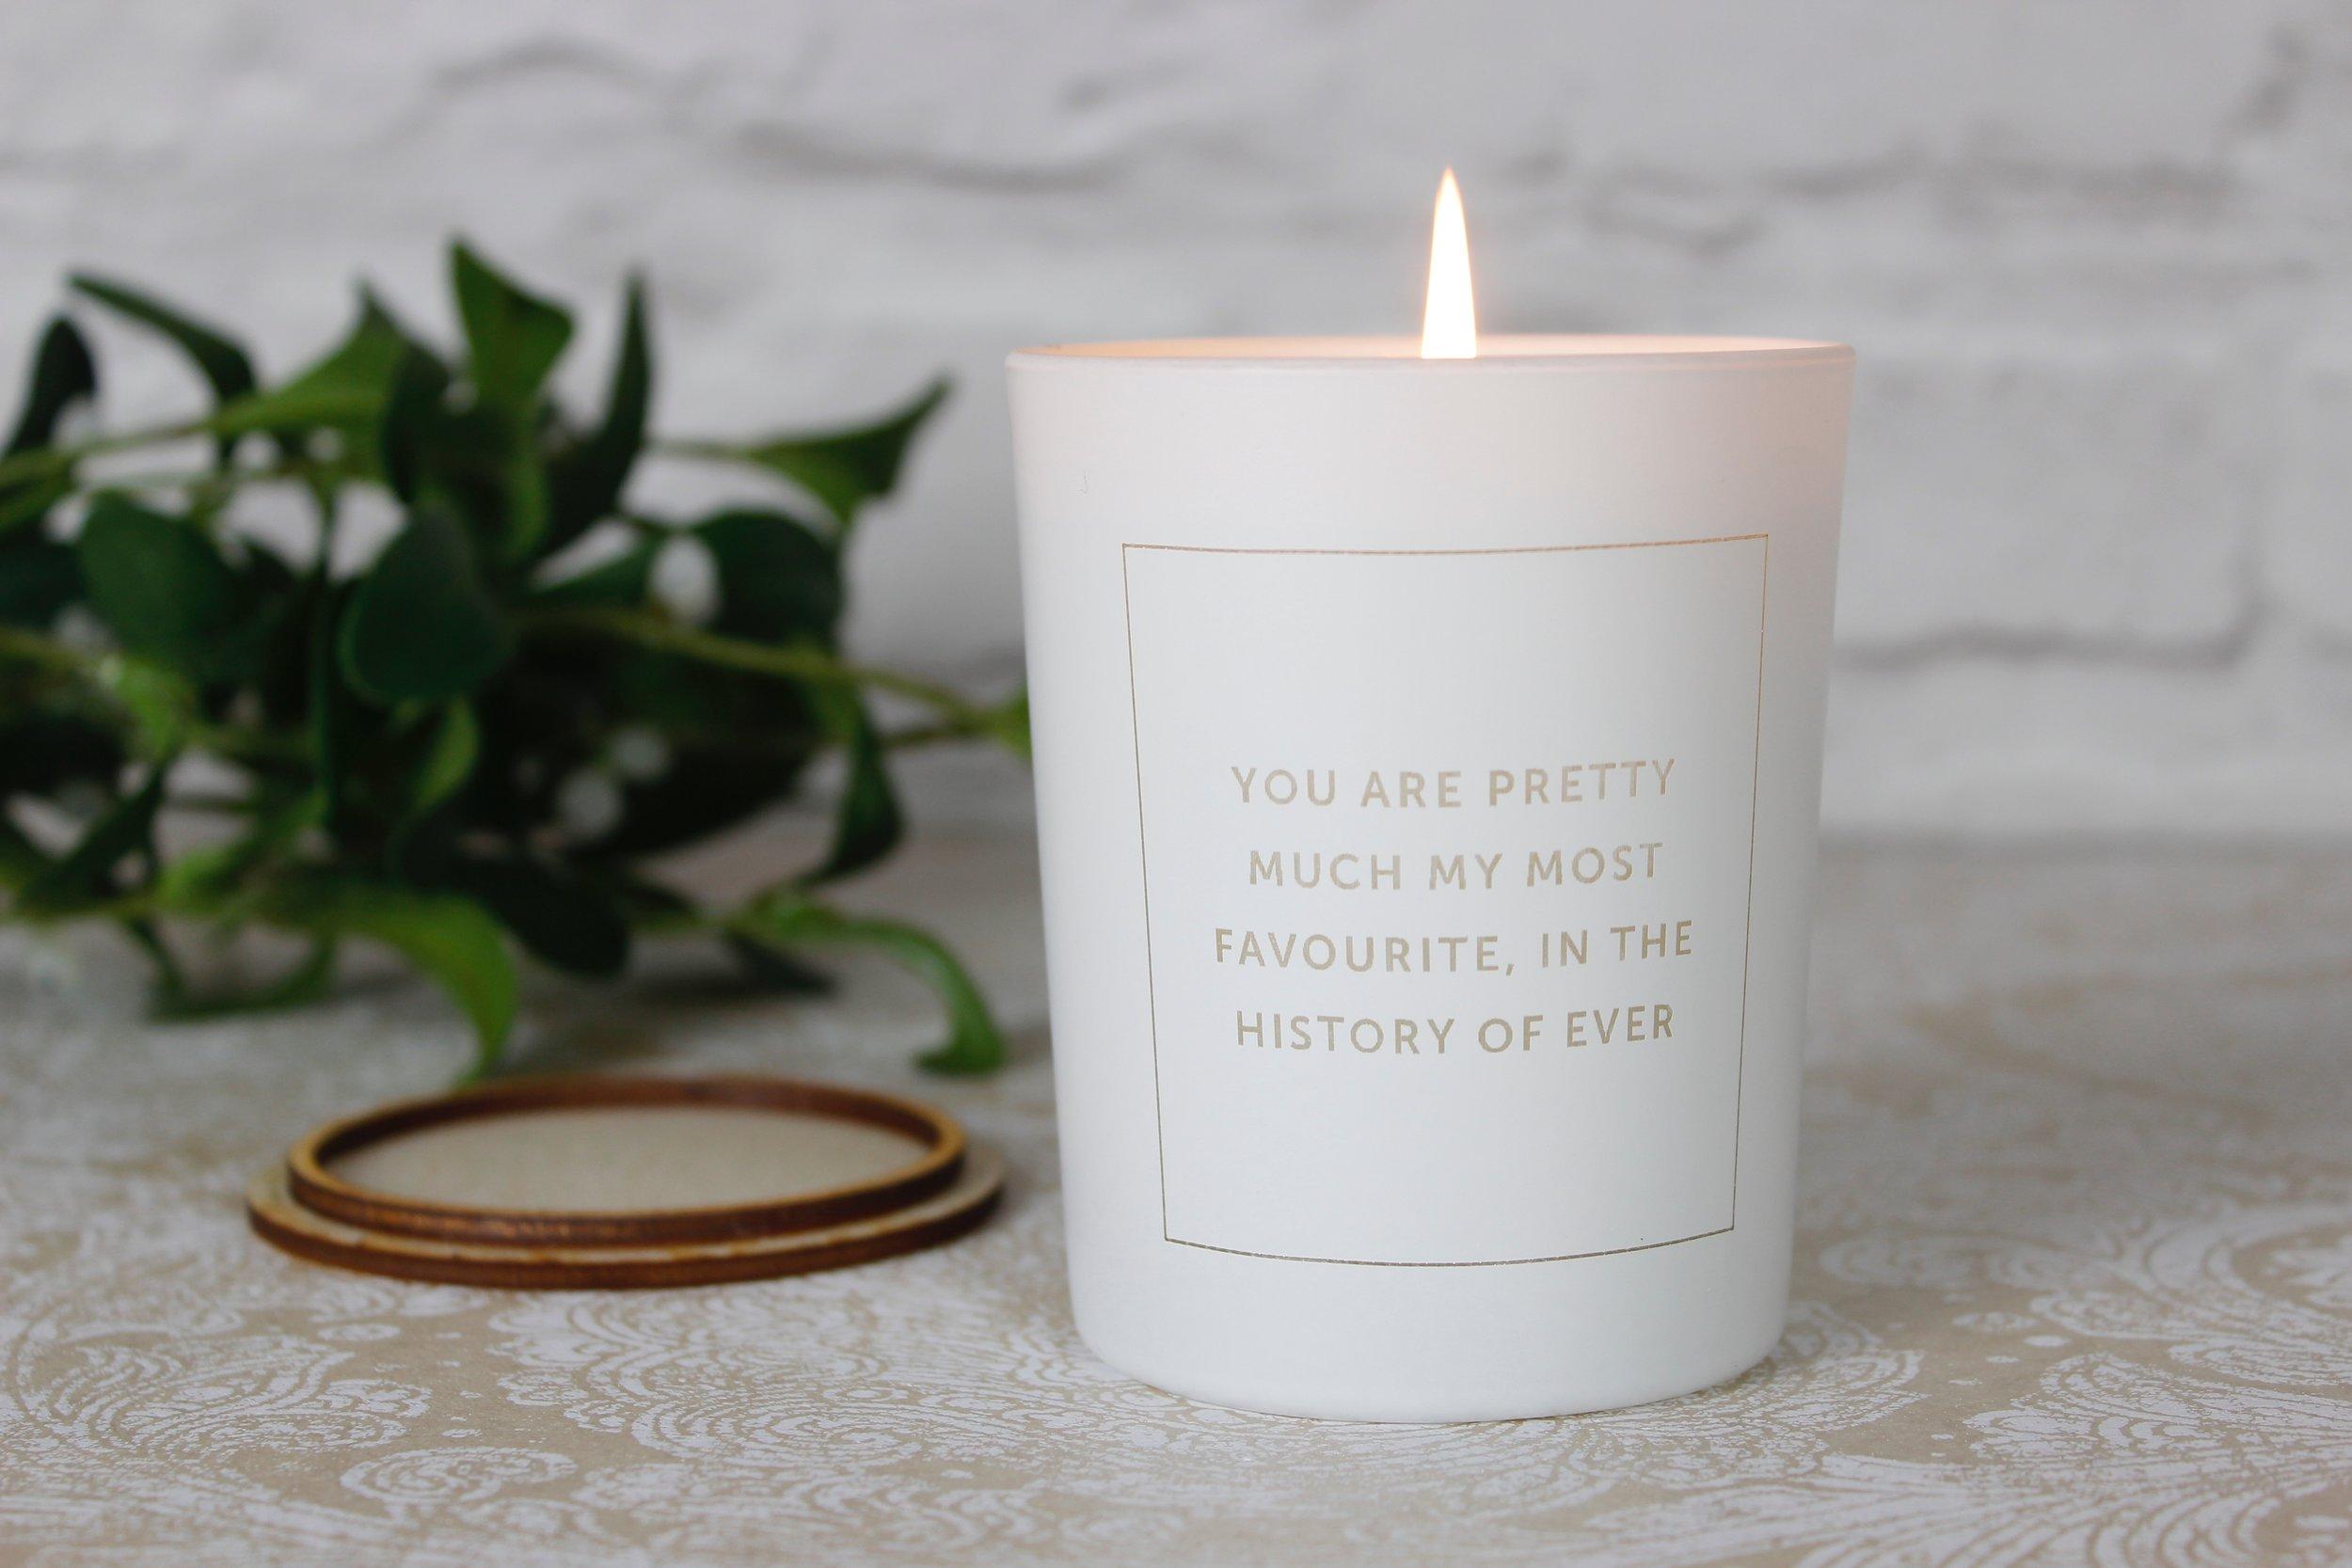 Product design agency for Love Inc Ltd, Tunbridge Wells based gift shop